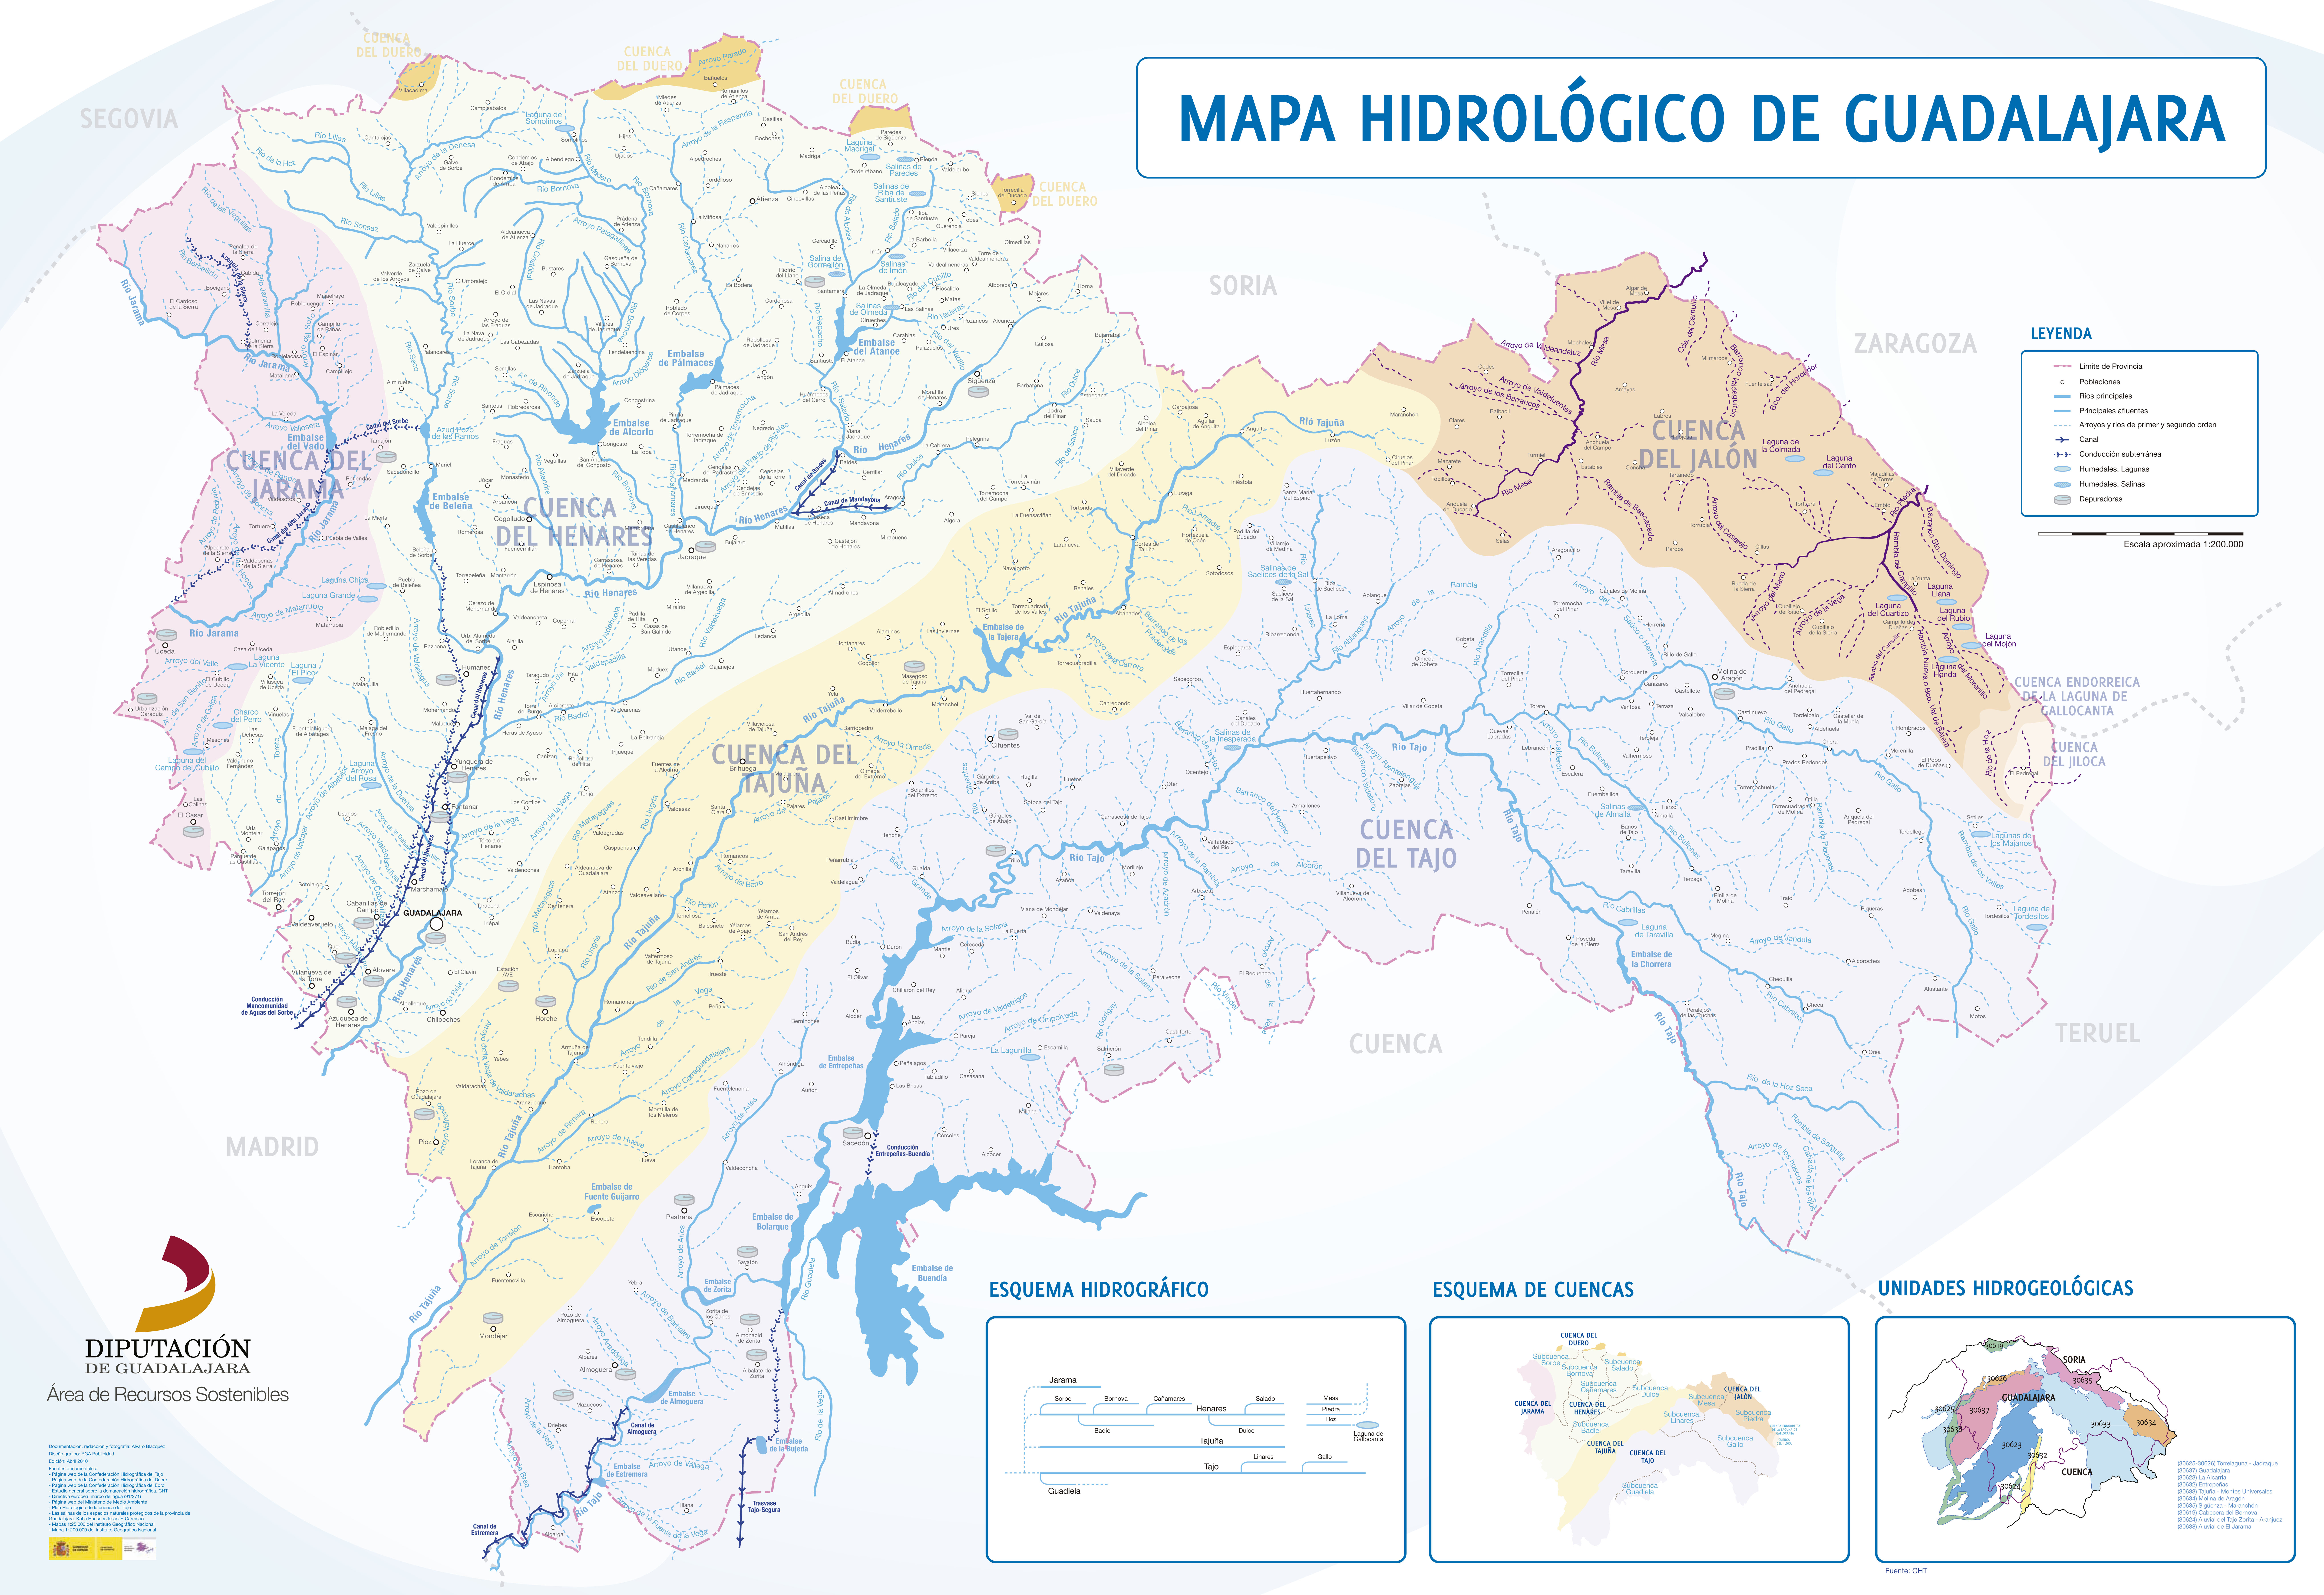 Mapa hidrológico de la Provincia de Guadalajara 2010